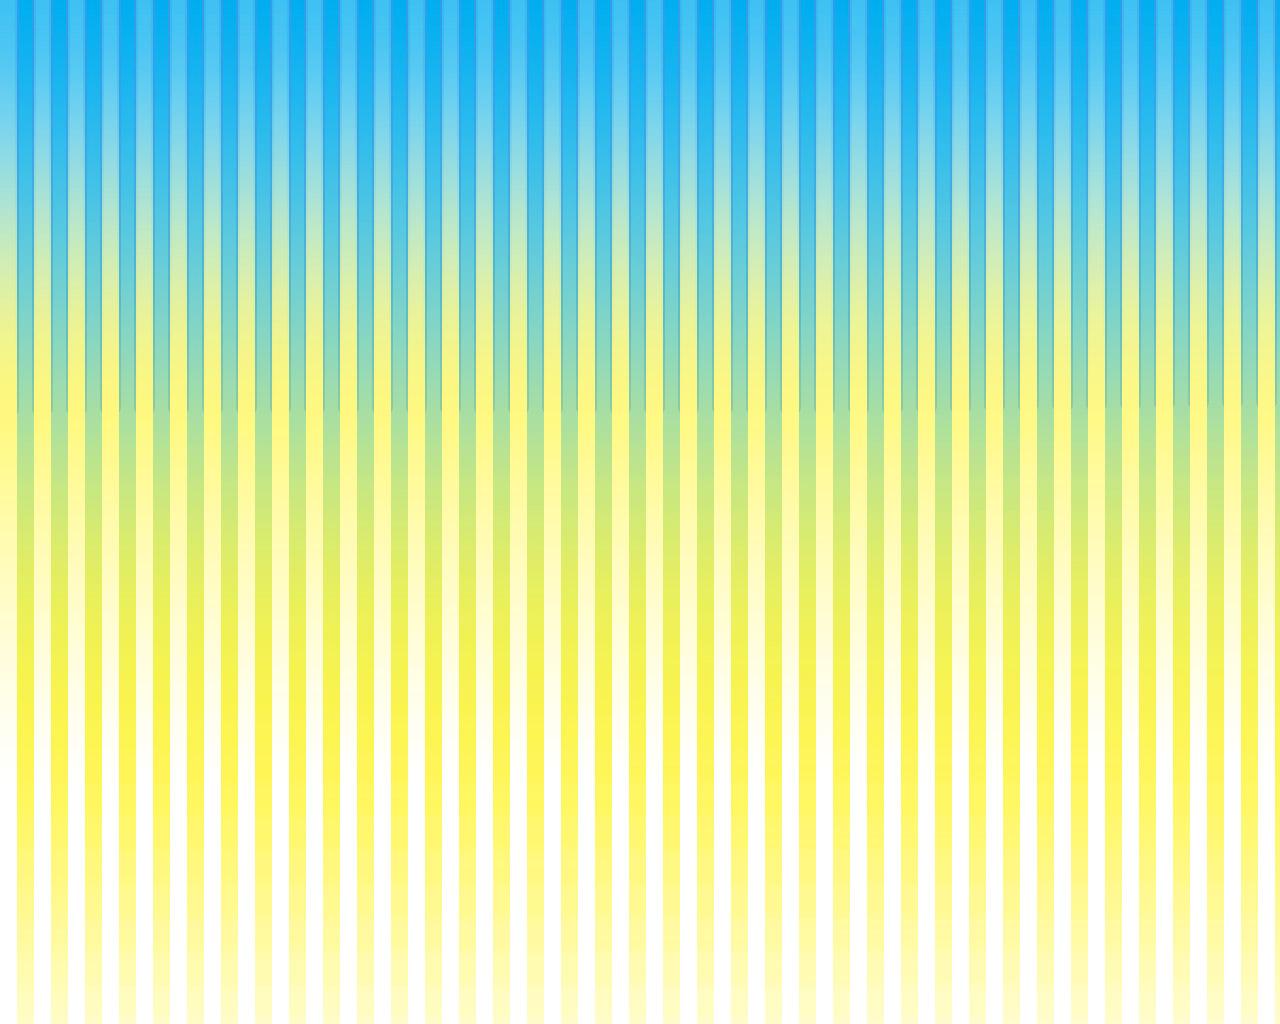 Blue Striped Wallpaper: Light Blue And Yellow Wallpaper